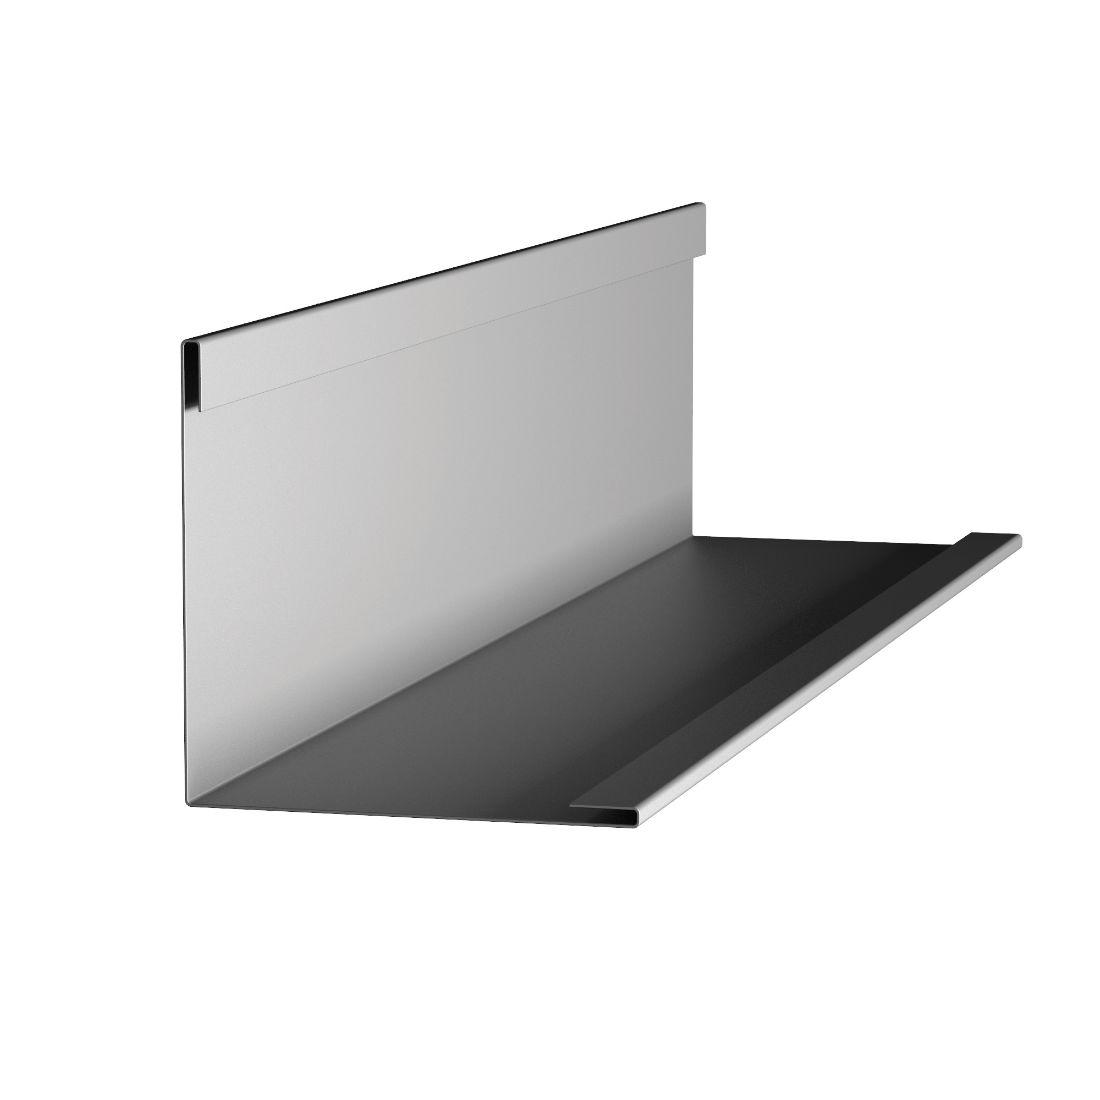 Internal 90 Angle Stainless Steel Flashing 3.0m